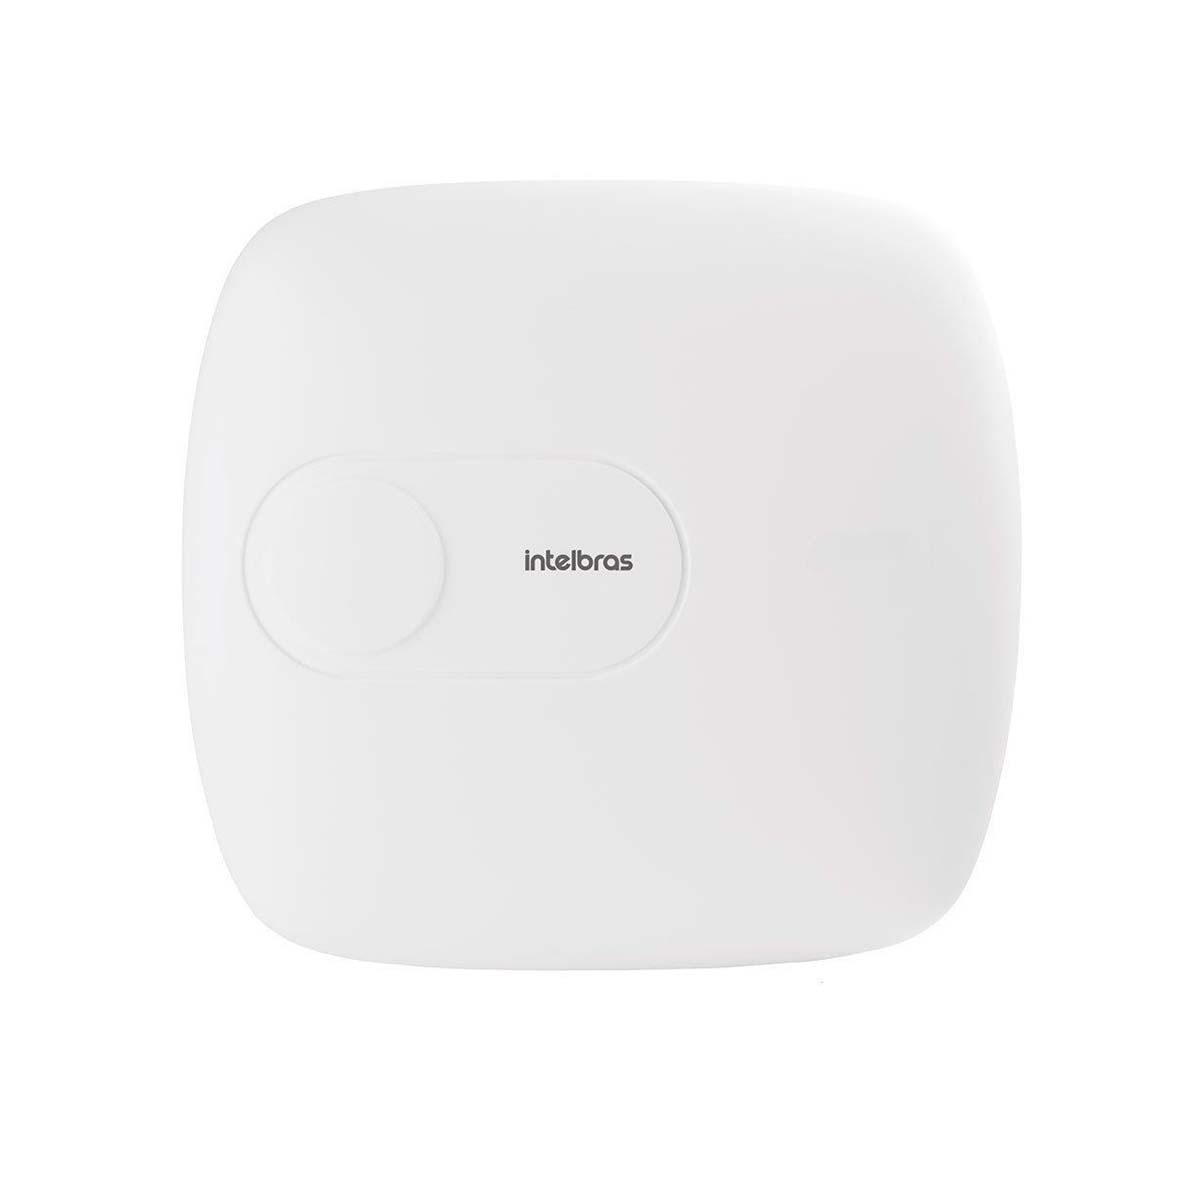 Kit Alarme Intelbras AMT 1016 NET 13 Sensores Sem Fio